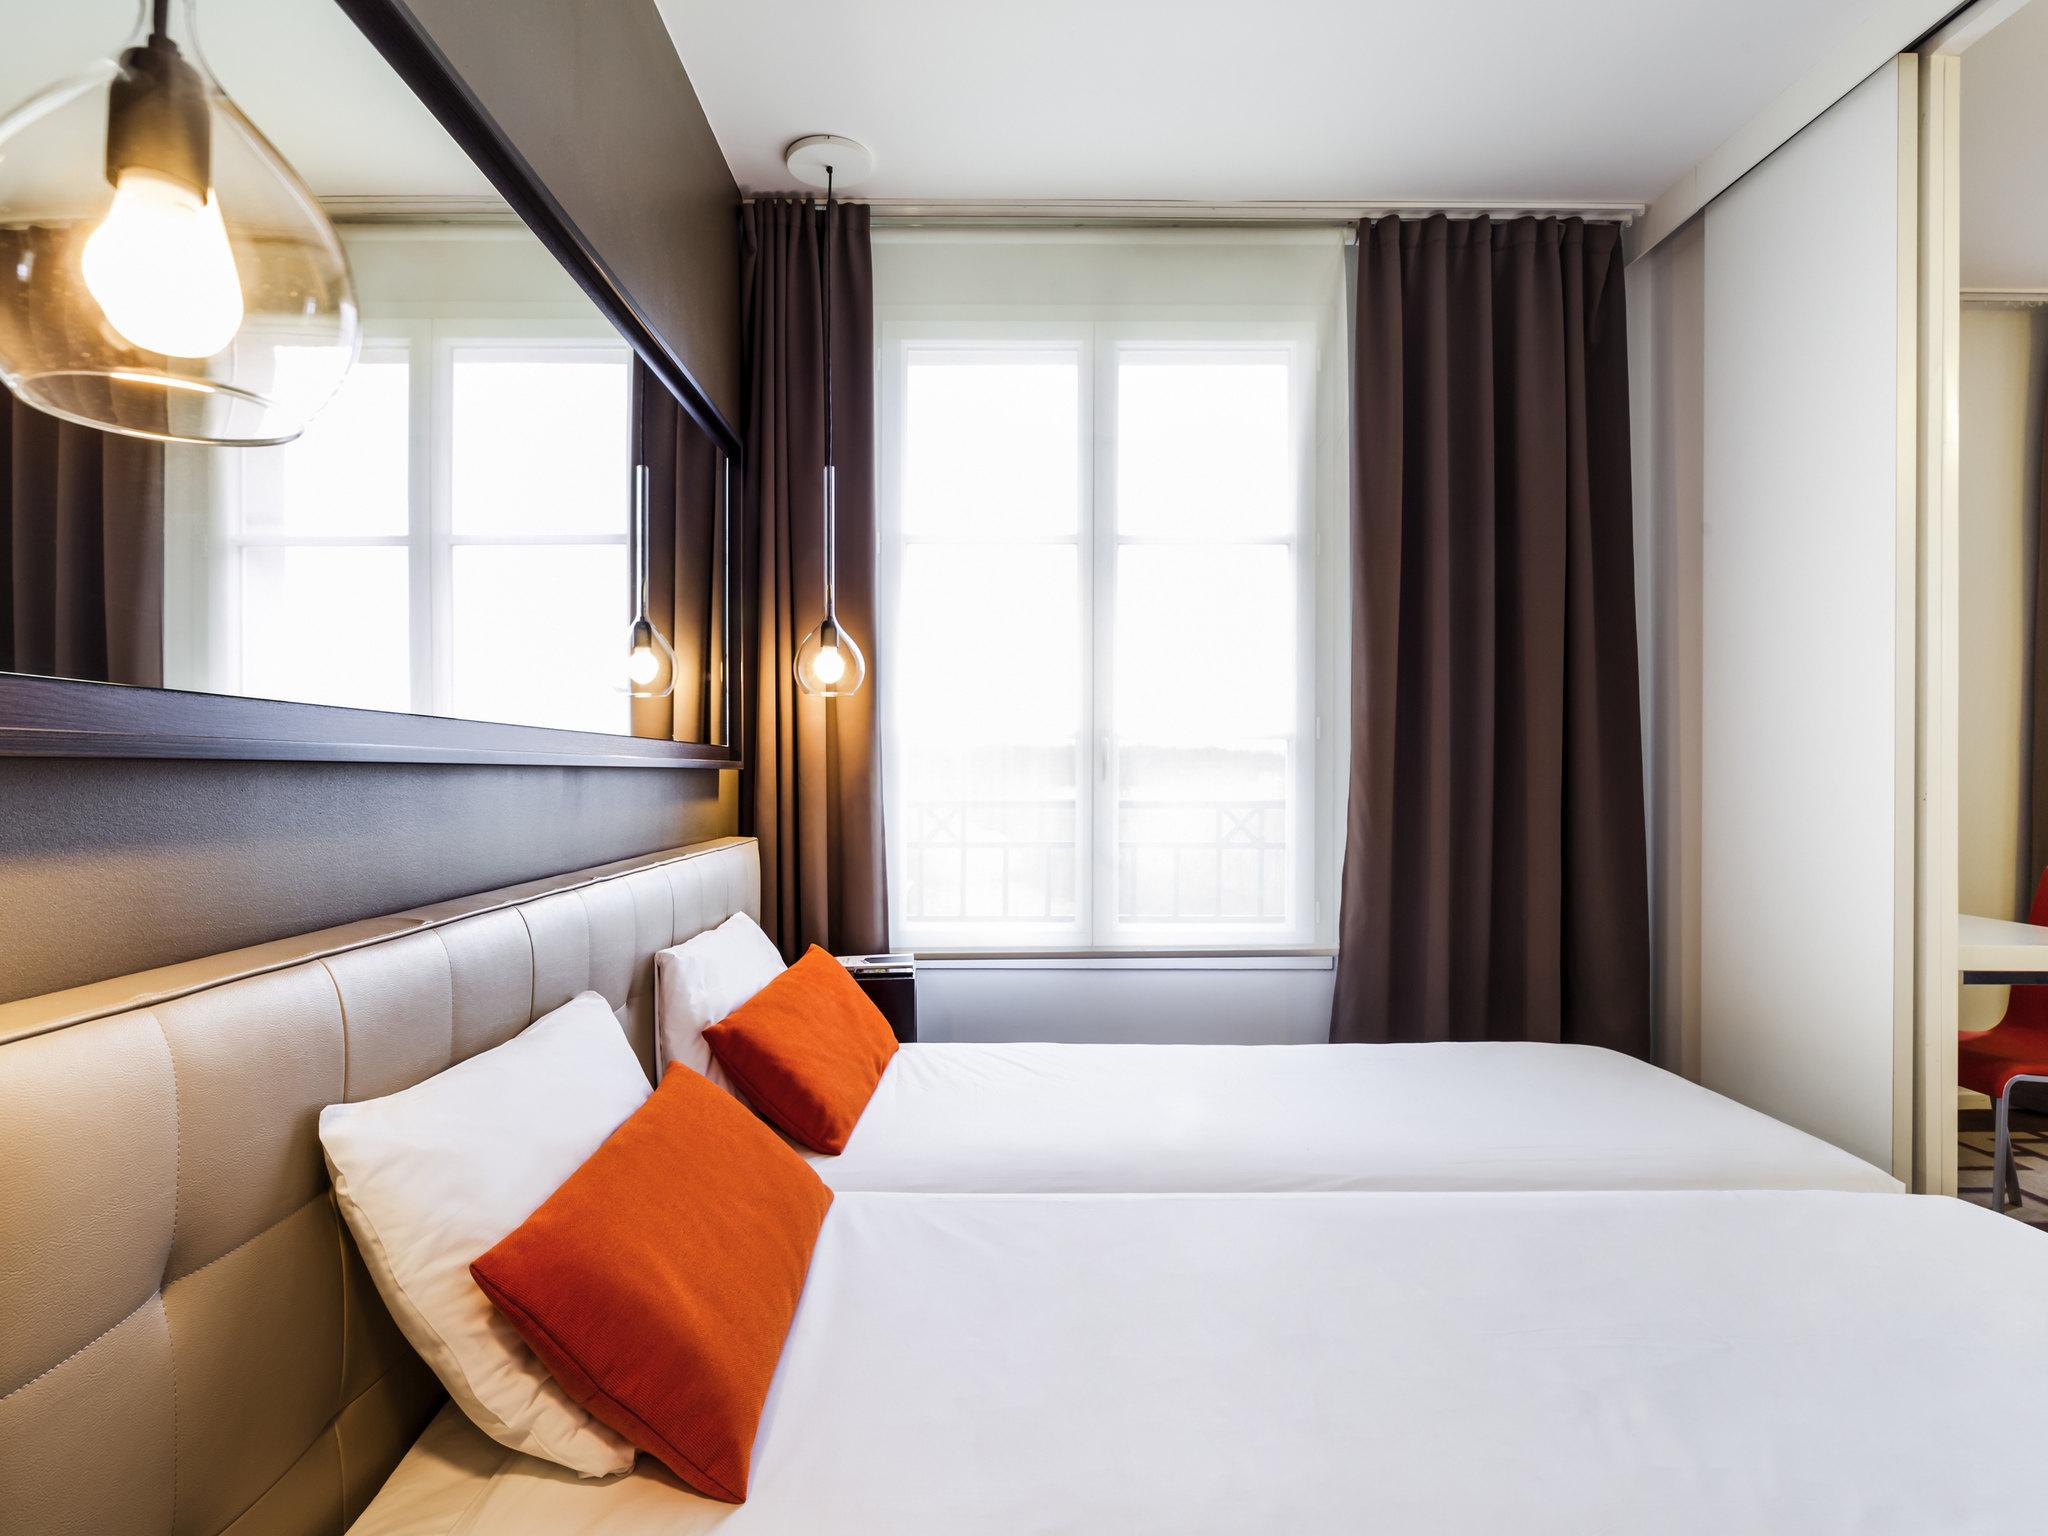 فندق - Hipark by Adagio Marseille